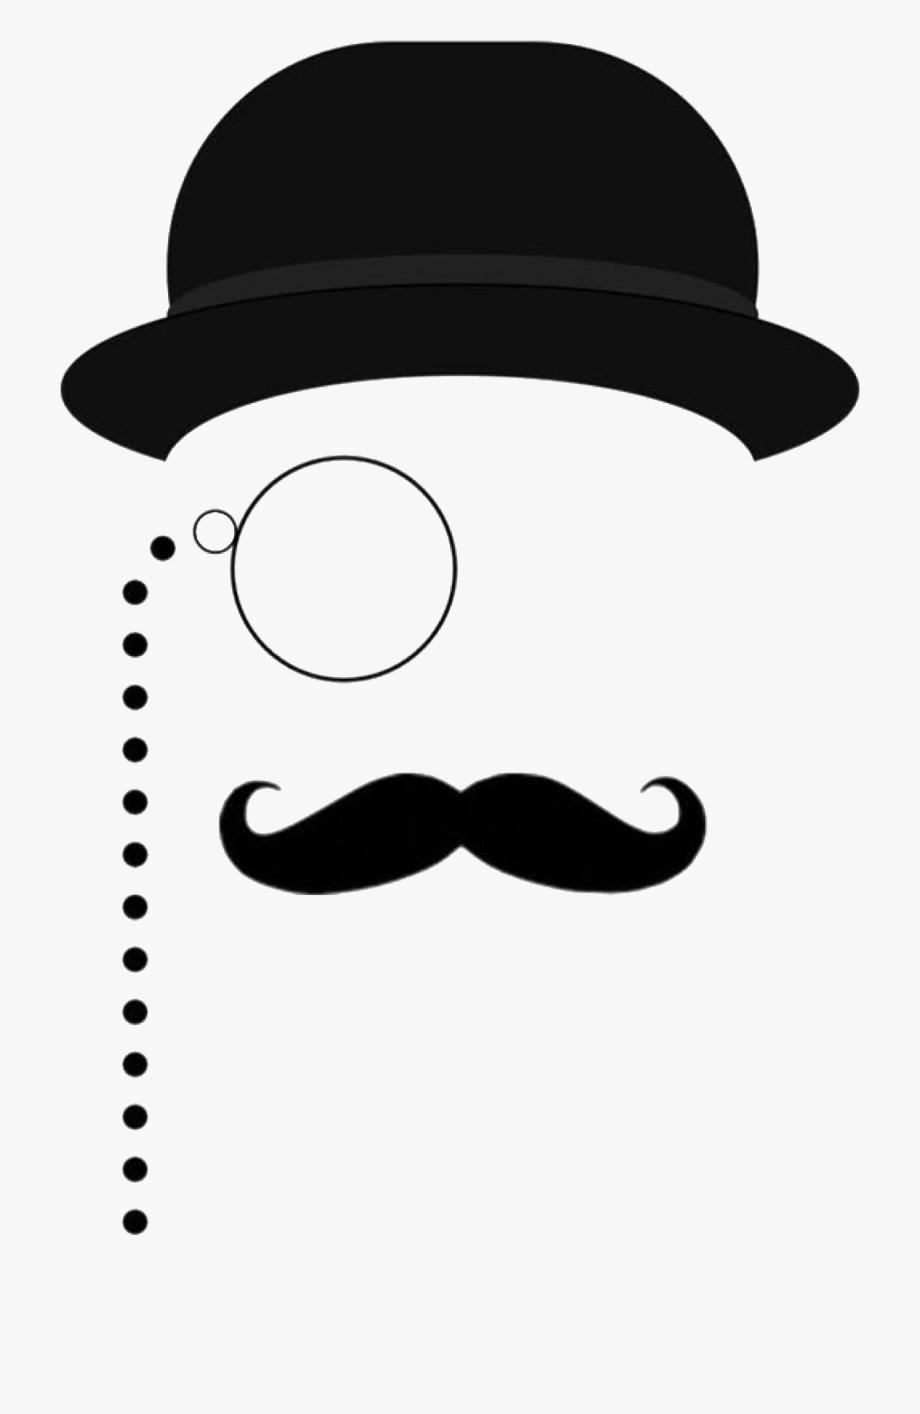 Silhouette man cliparts . Mustache clipart bowler hat